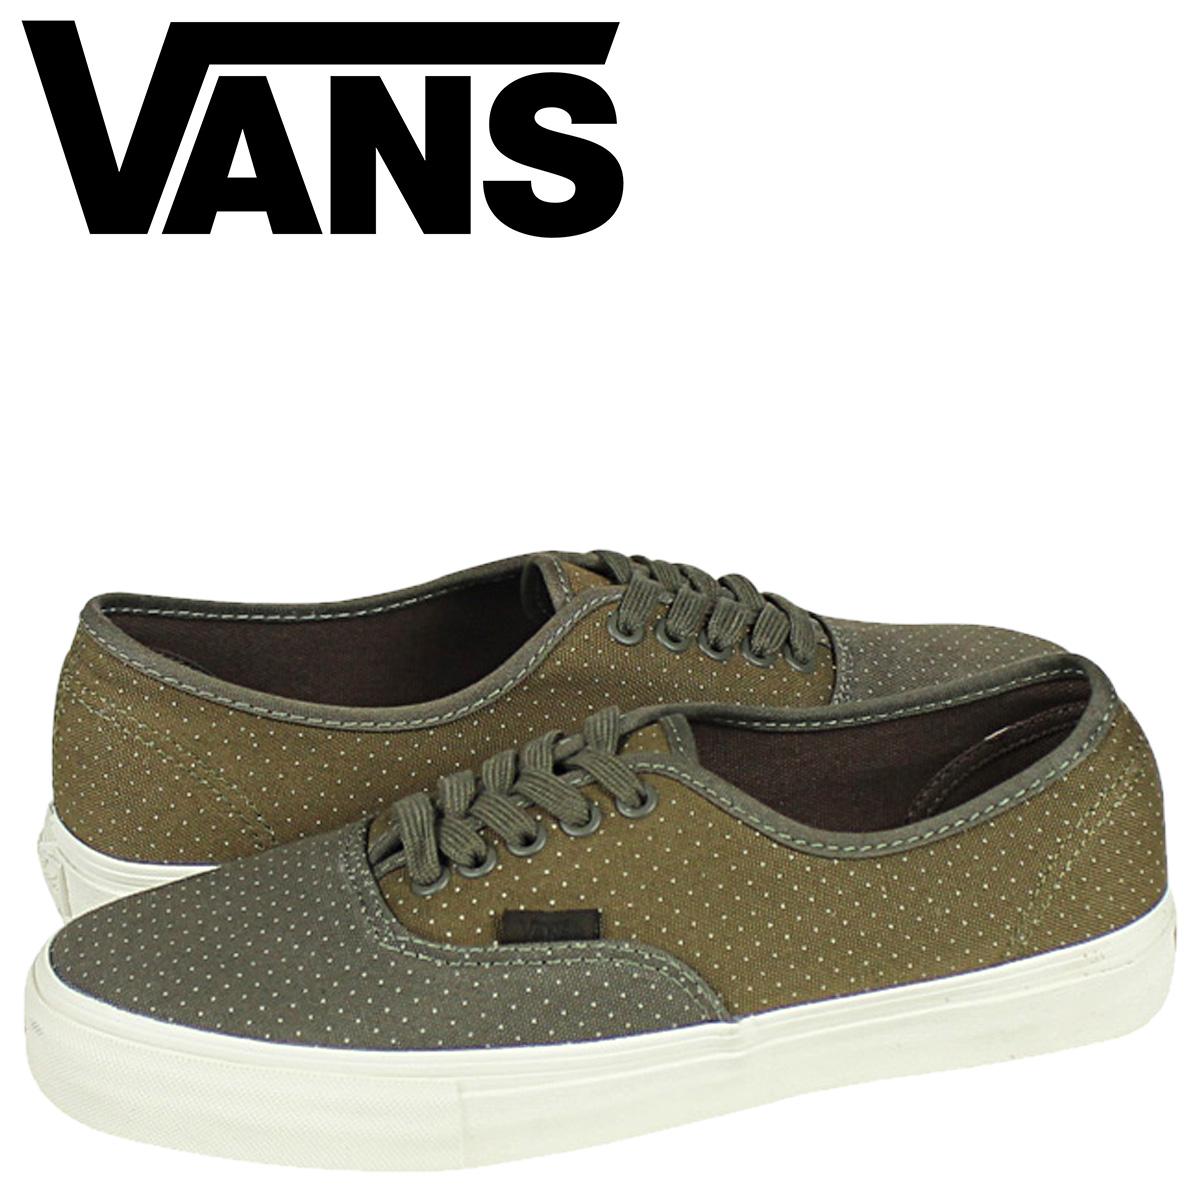 6cd046a7298adb Sugar Online Shop  Point 2 x vans VAULT AUTHENTIC LX sneaker Vault ...